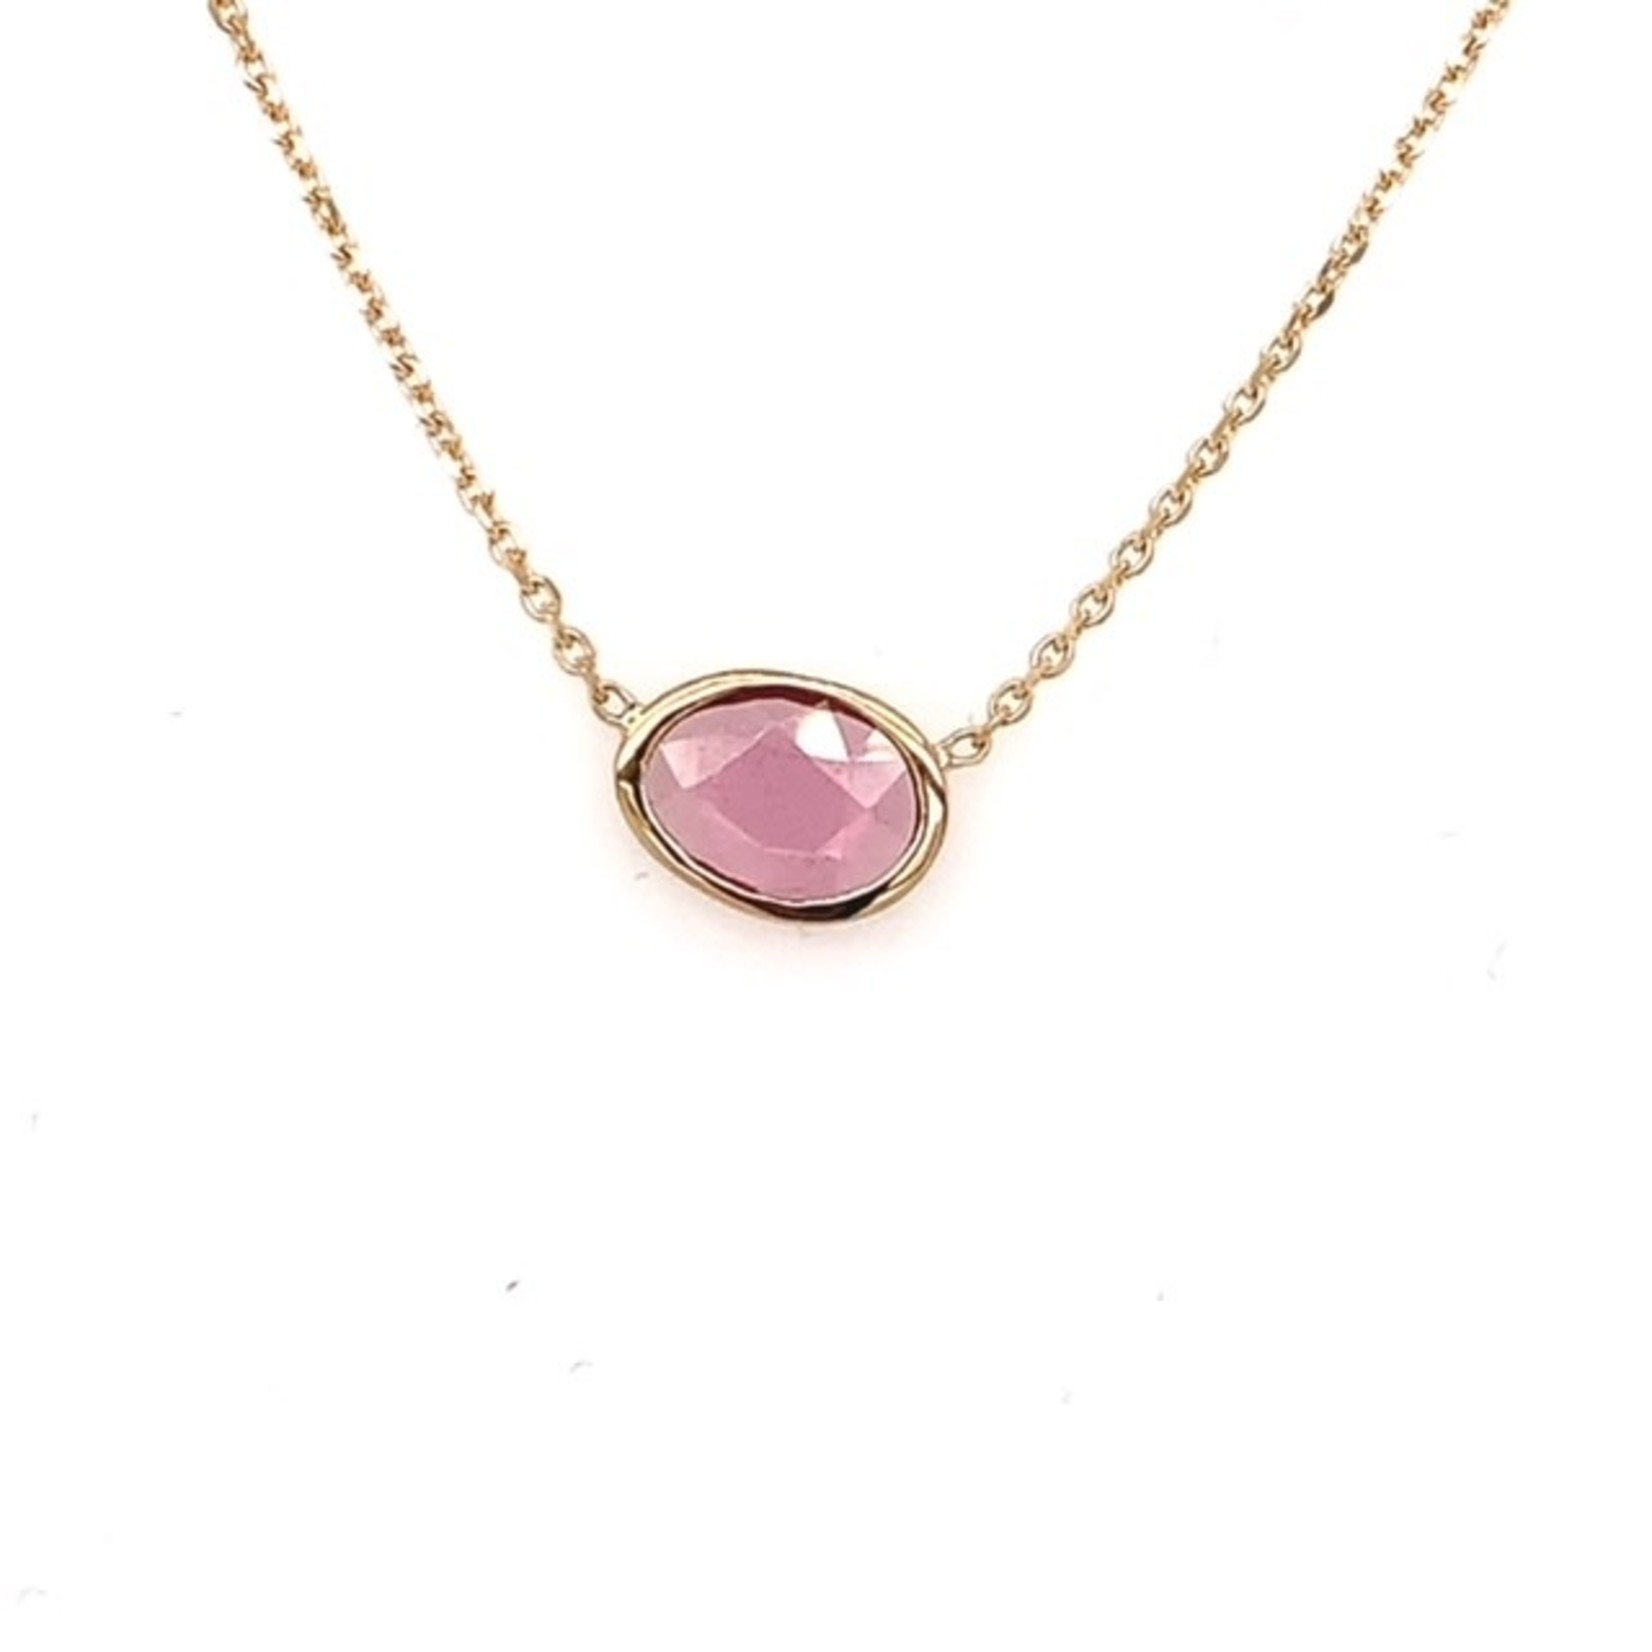 On The Edge Unique Beauty - Pink Rhodolite Garnet